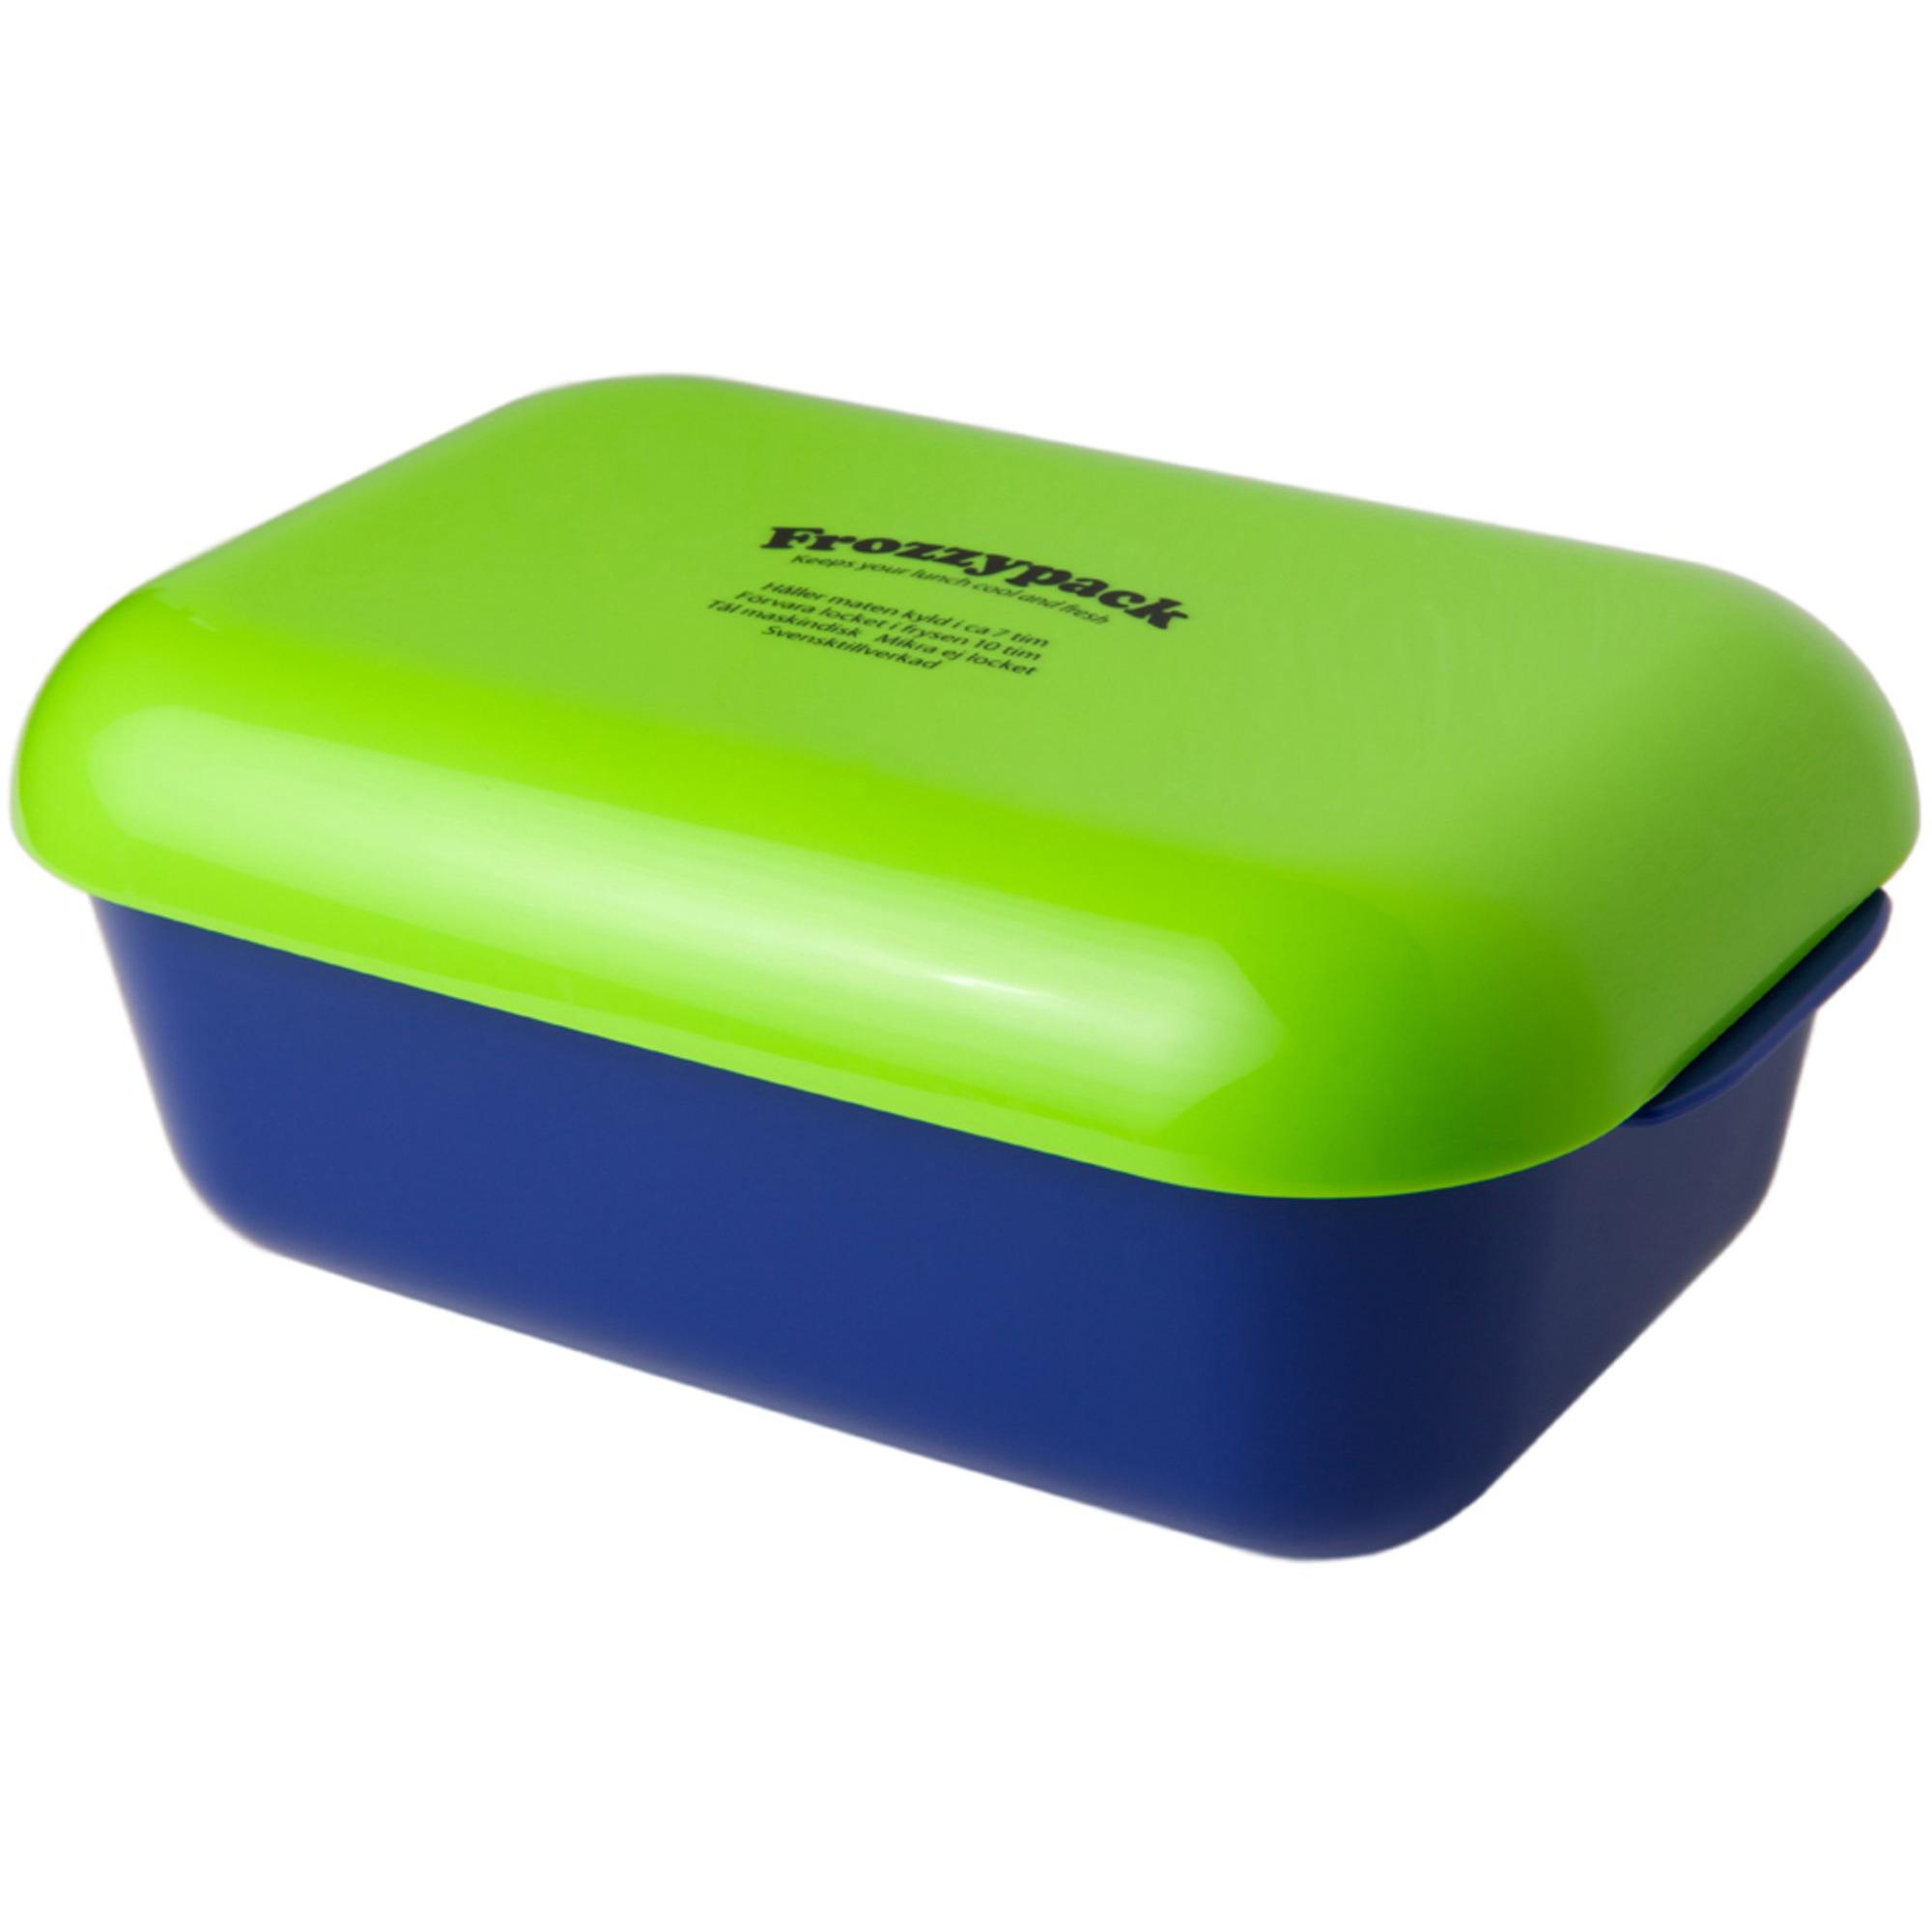 Frozzypack Kylmatlåda Joyful Edition Blue Green